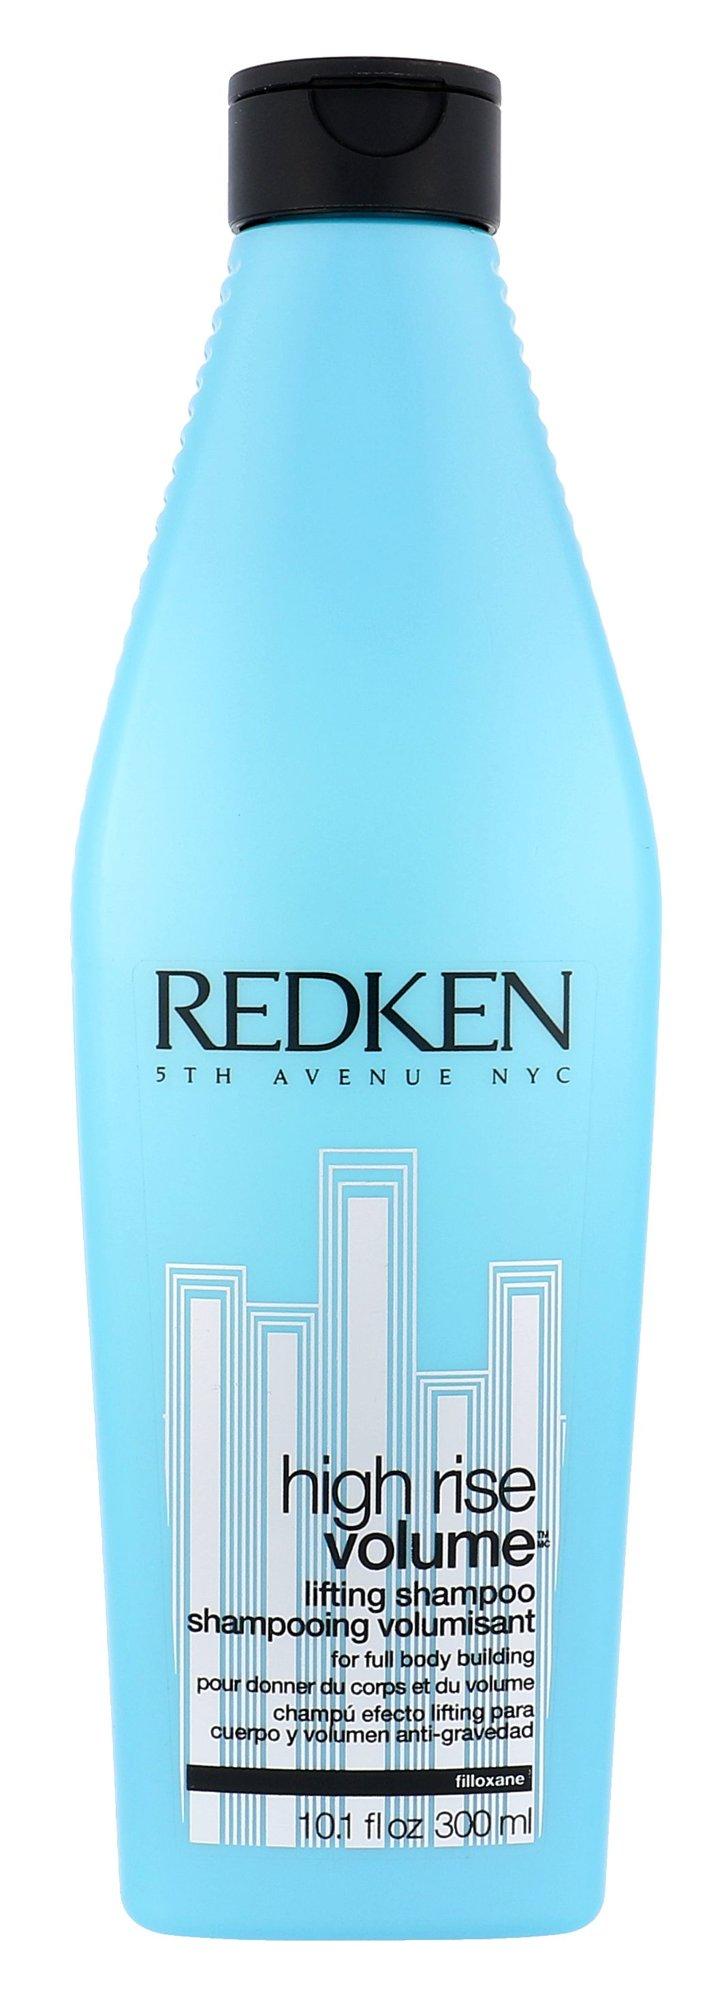 Redken High Rise Volume Lifting Shampoo Cosmetic 300ml